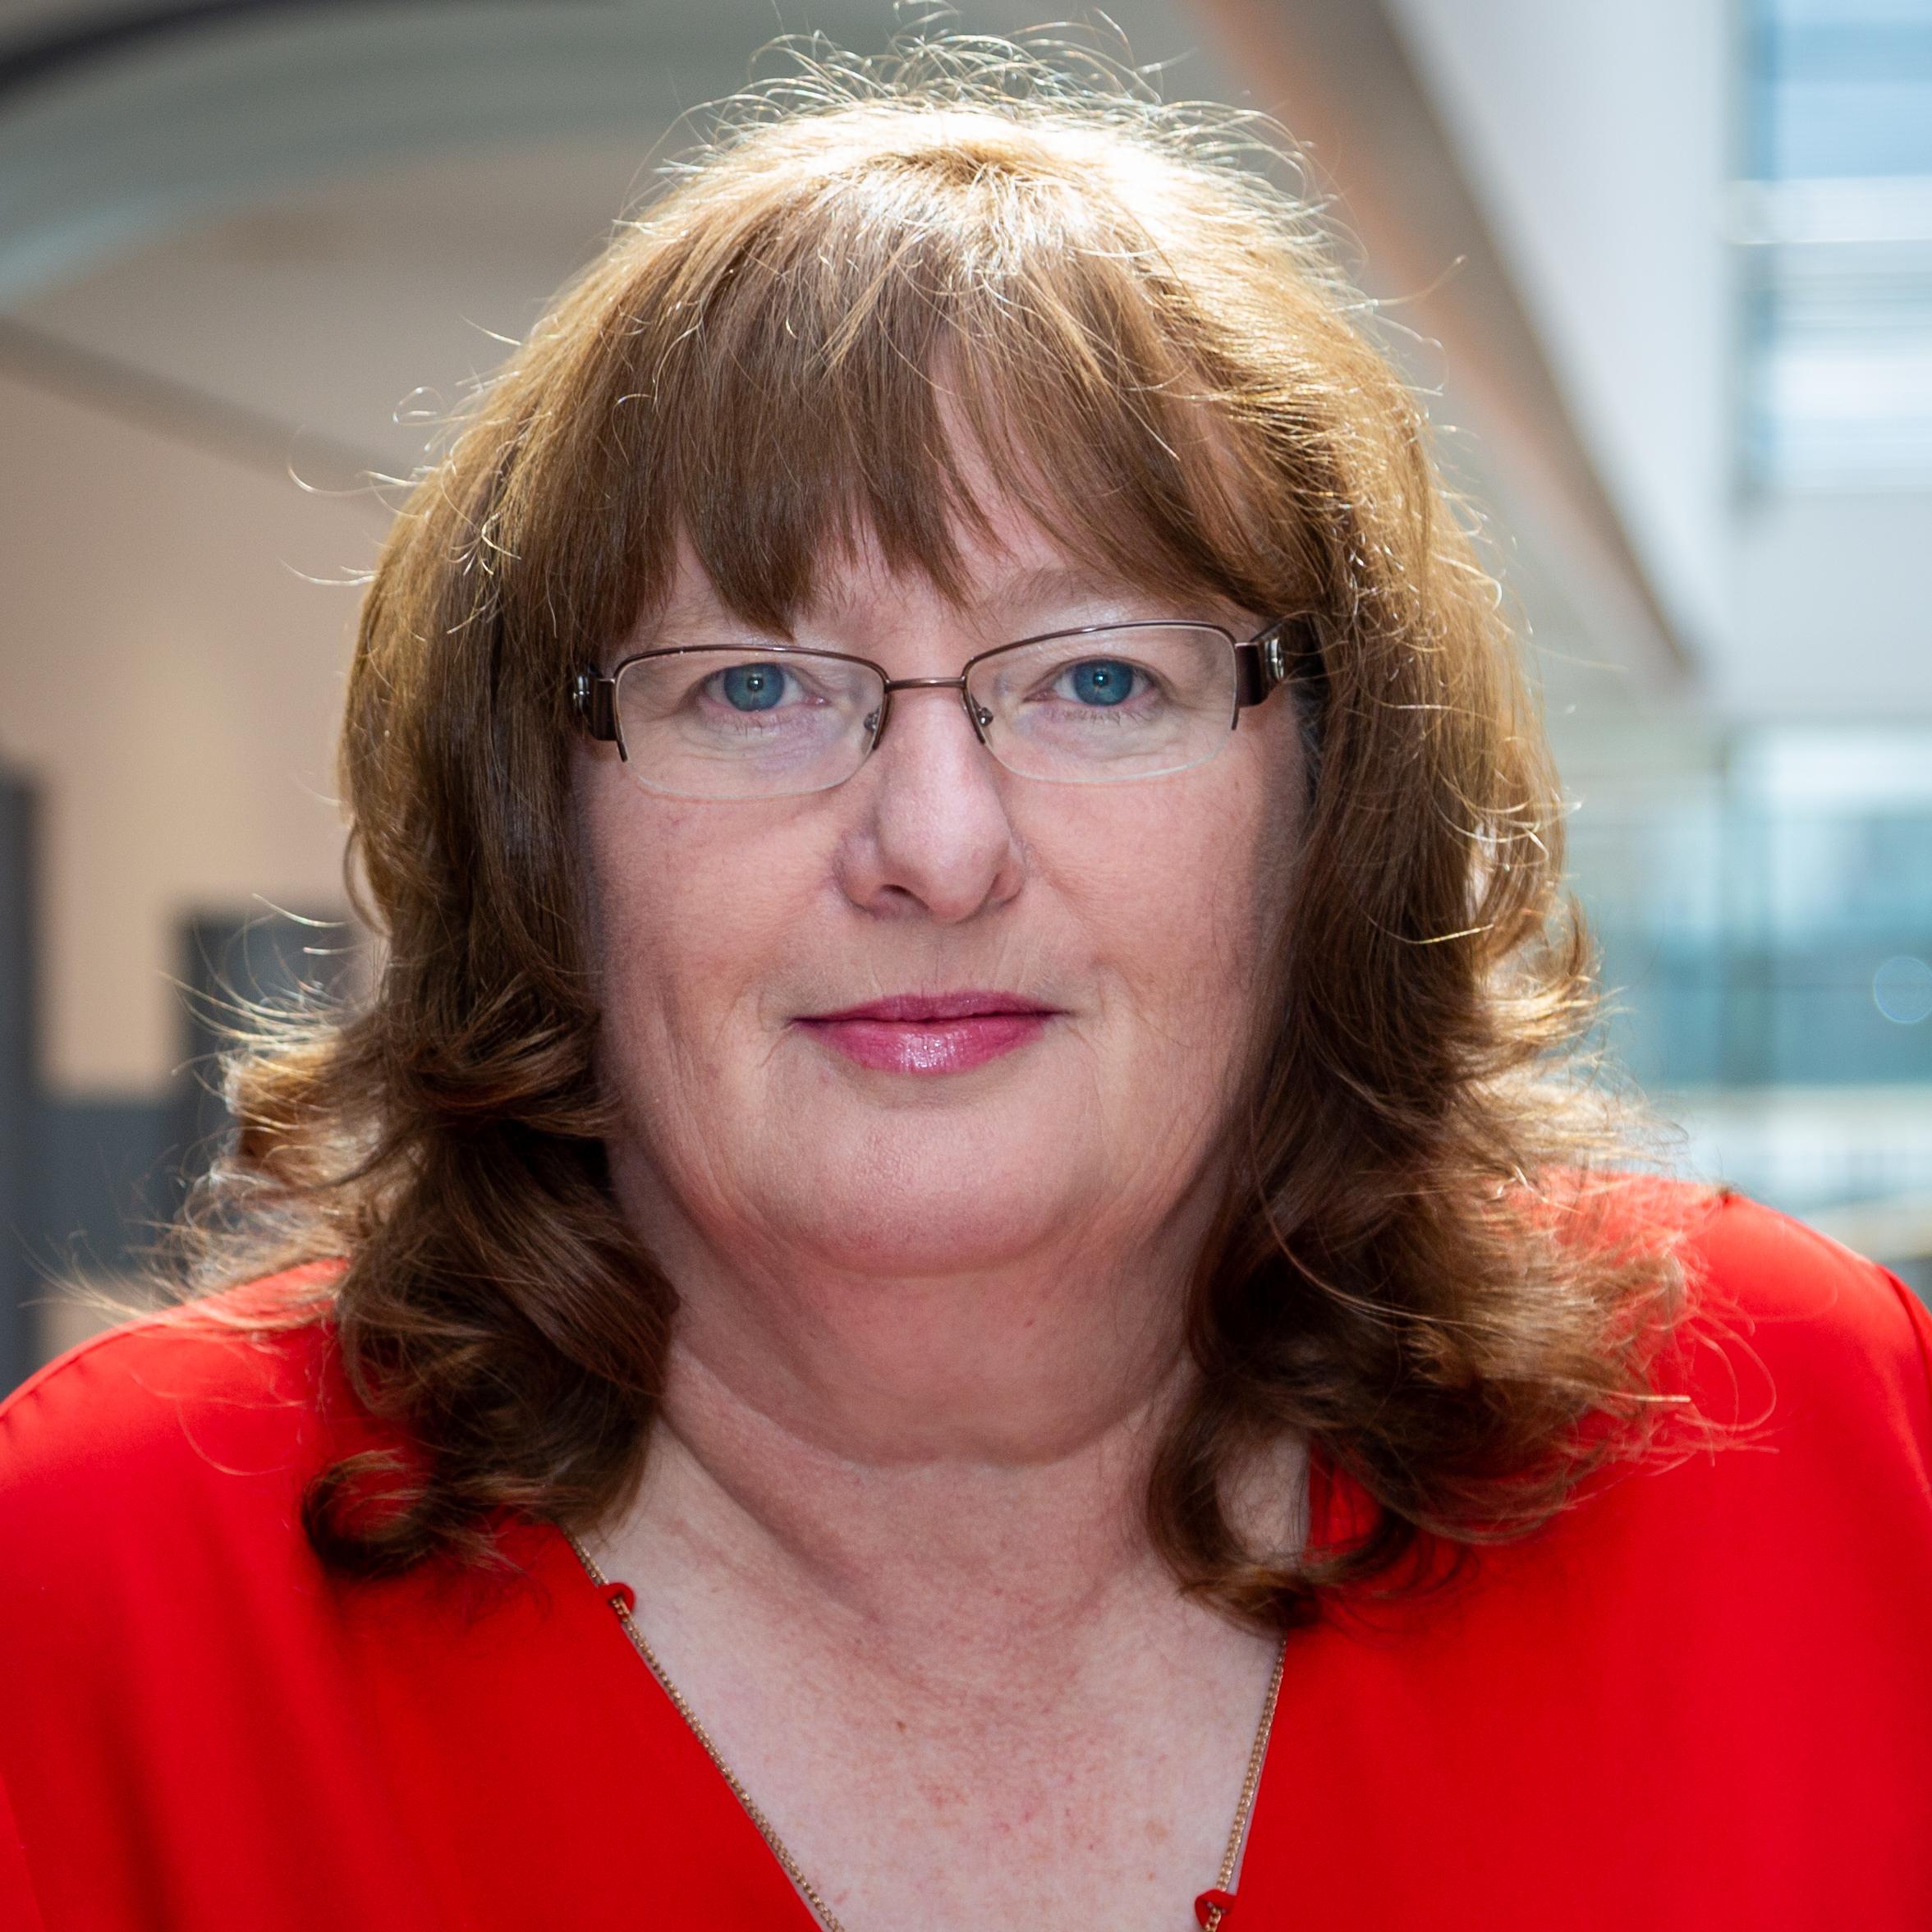 Carol Barron, Assistant Professor in Dublin City University, Ireland